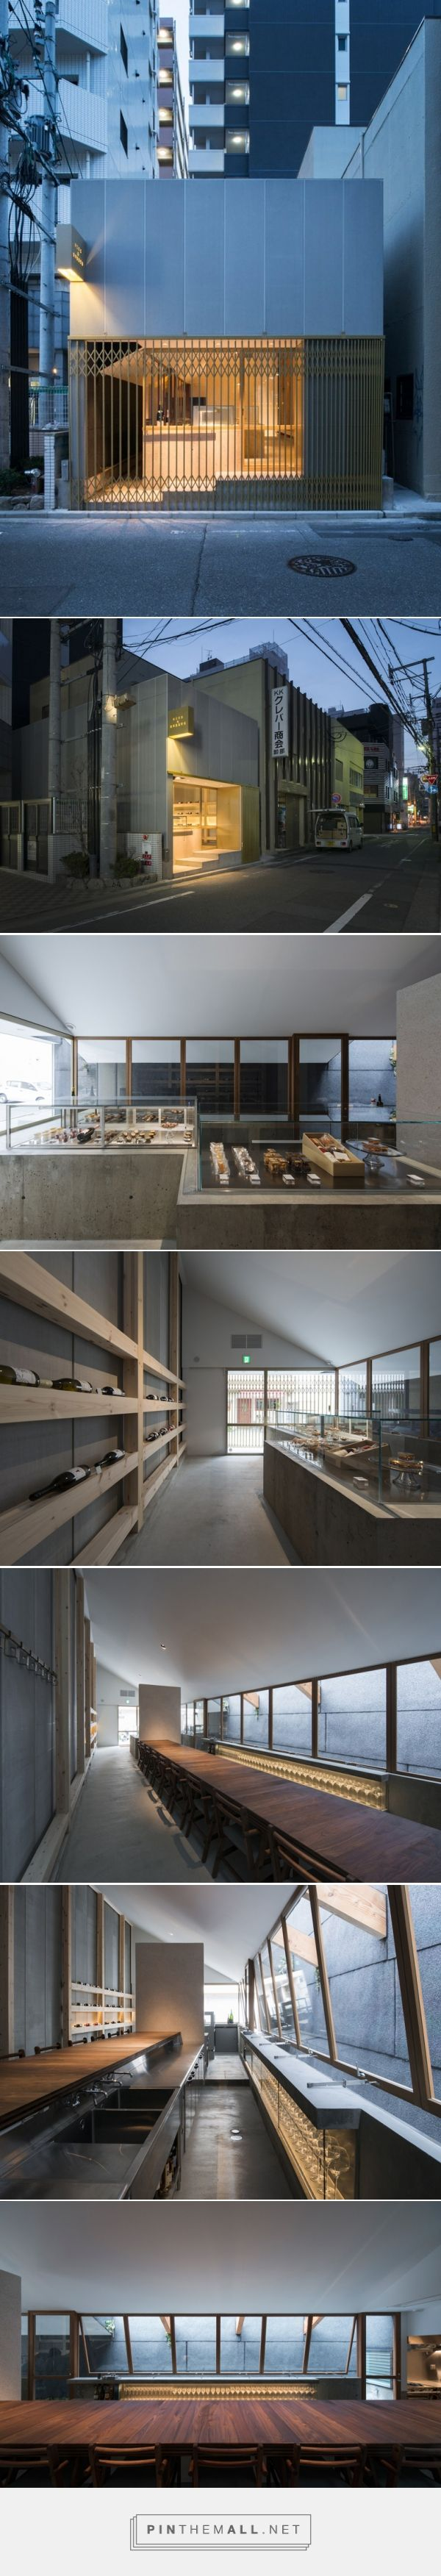 Tsumons   A Wine U0026 Sweets Shop Grows In Fukuoka   Spoon U0026 Tamago   Created  · Cafe Interior DesignWine Shop InteriorBakery ...